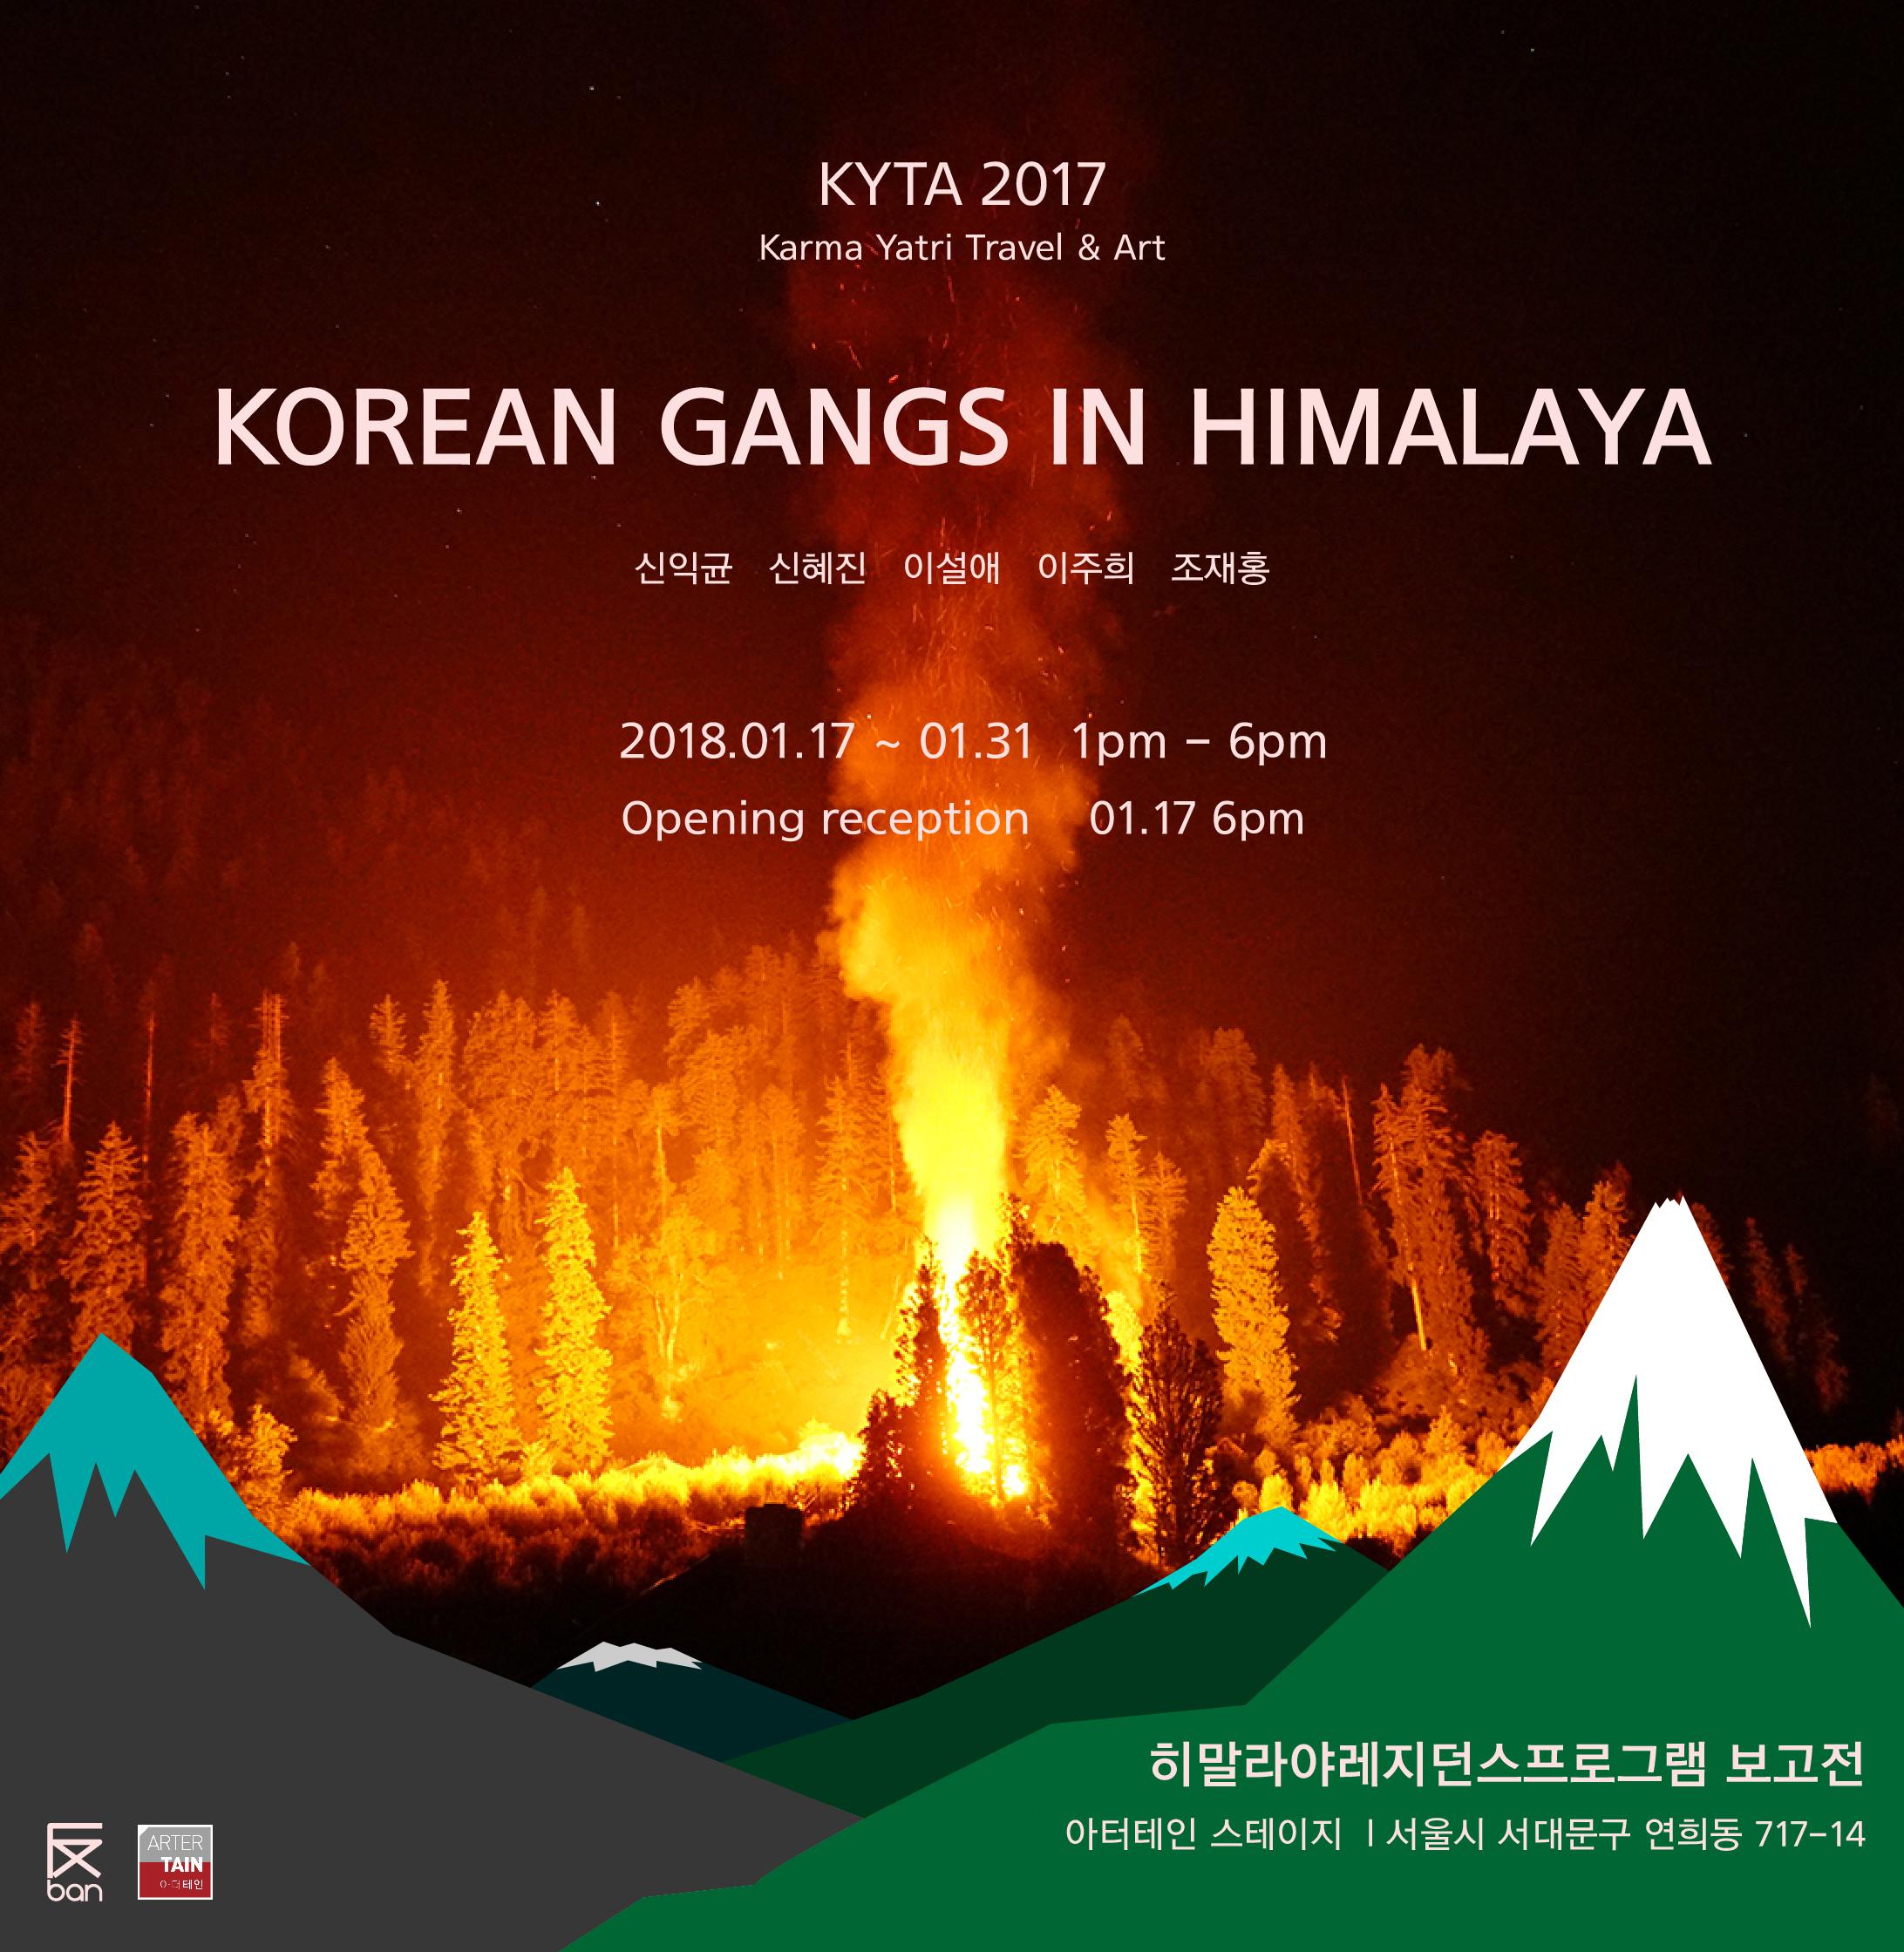 #KYTA2017: Archive & Walkthrough